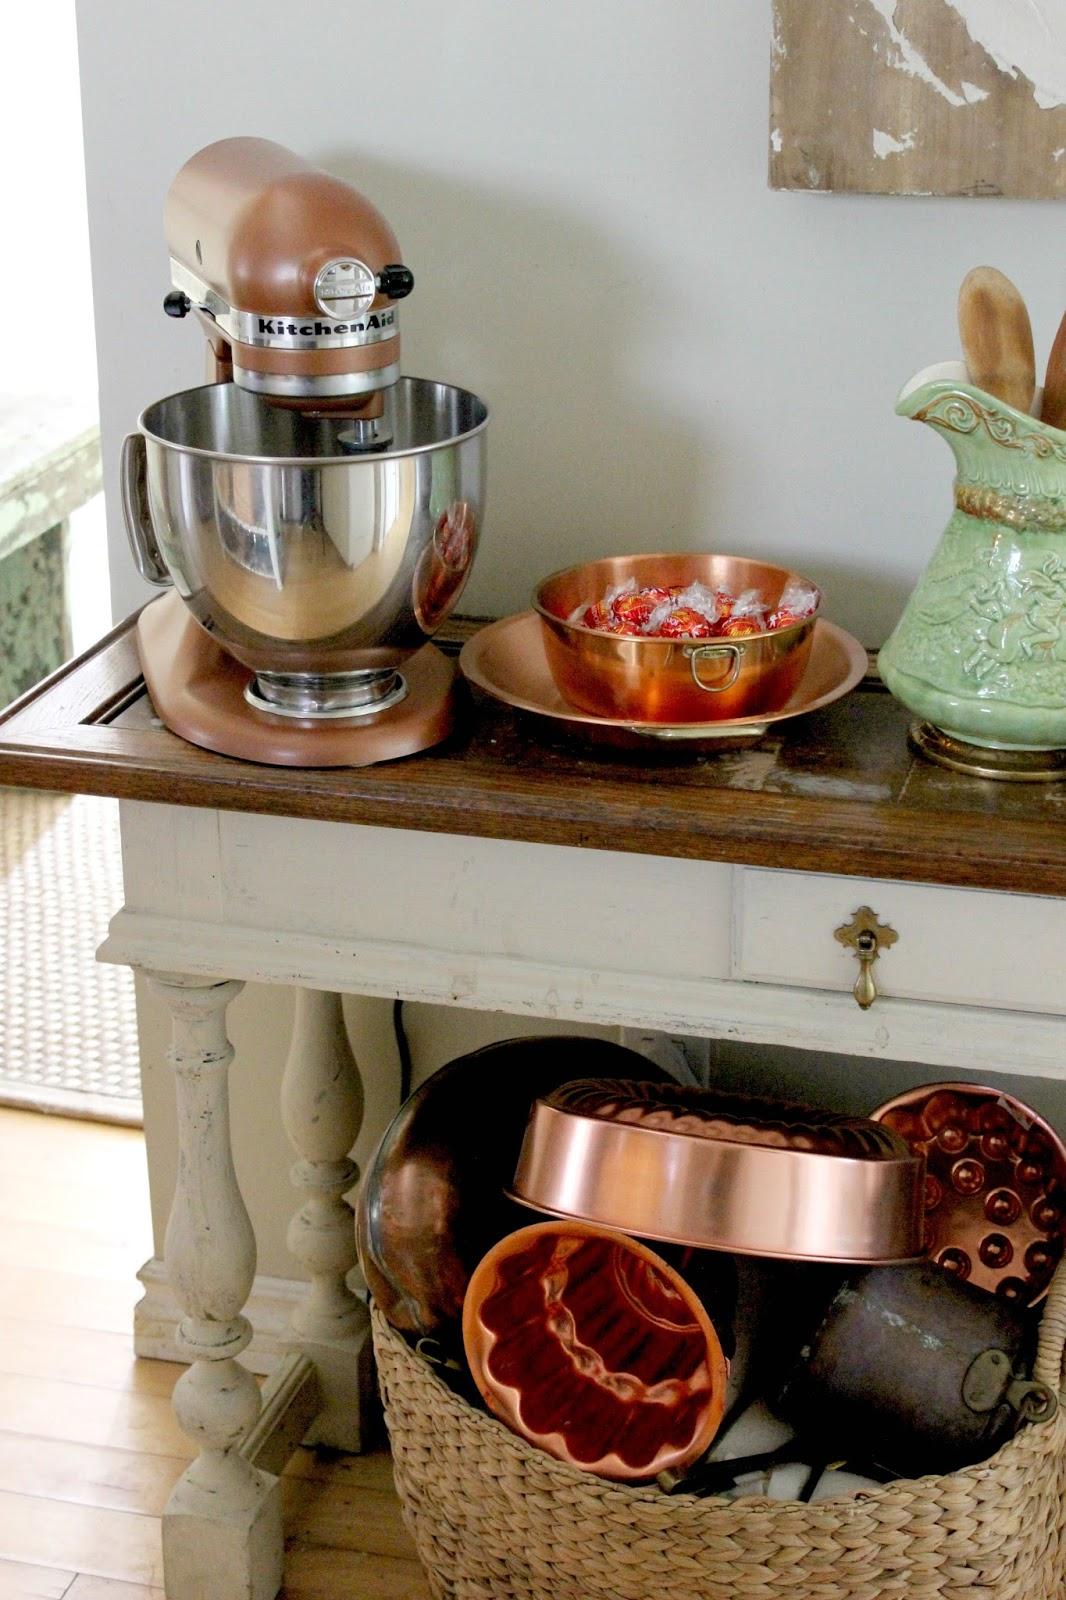 Maison Decor: February 2018 on copper keurig, copper disney, copper canisters at walmart, copper flatware,